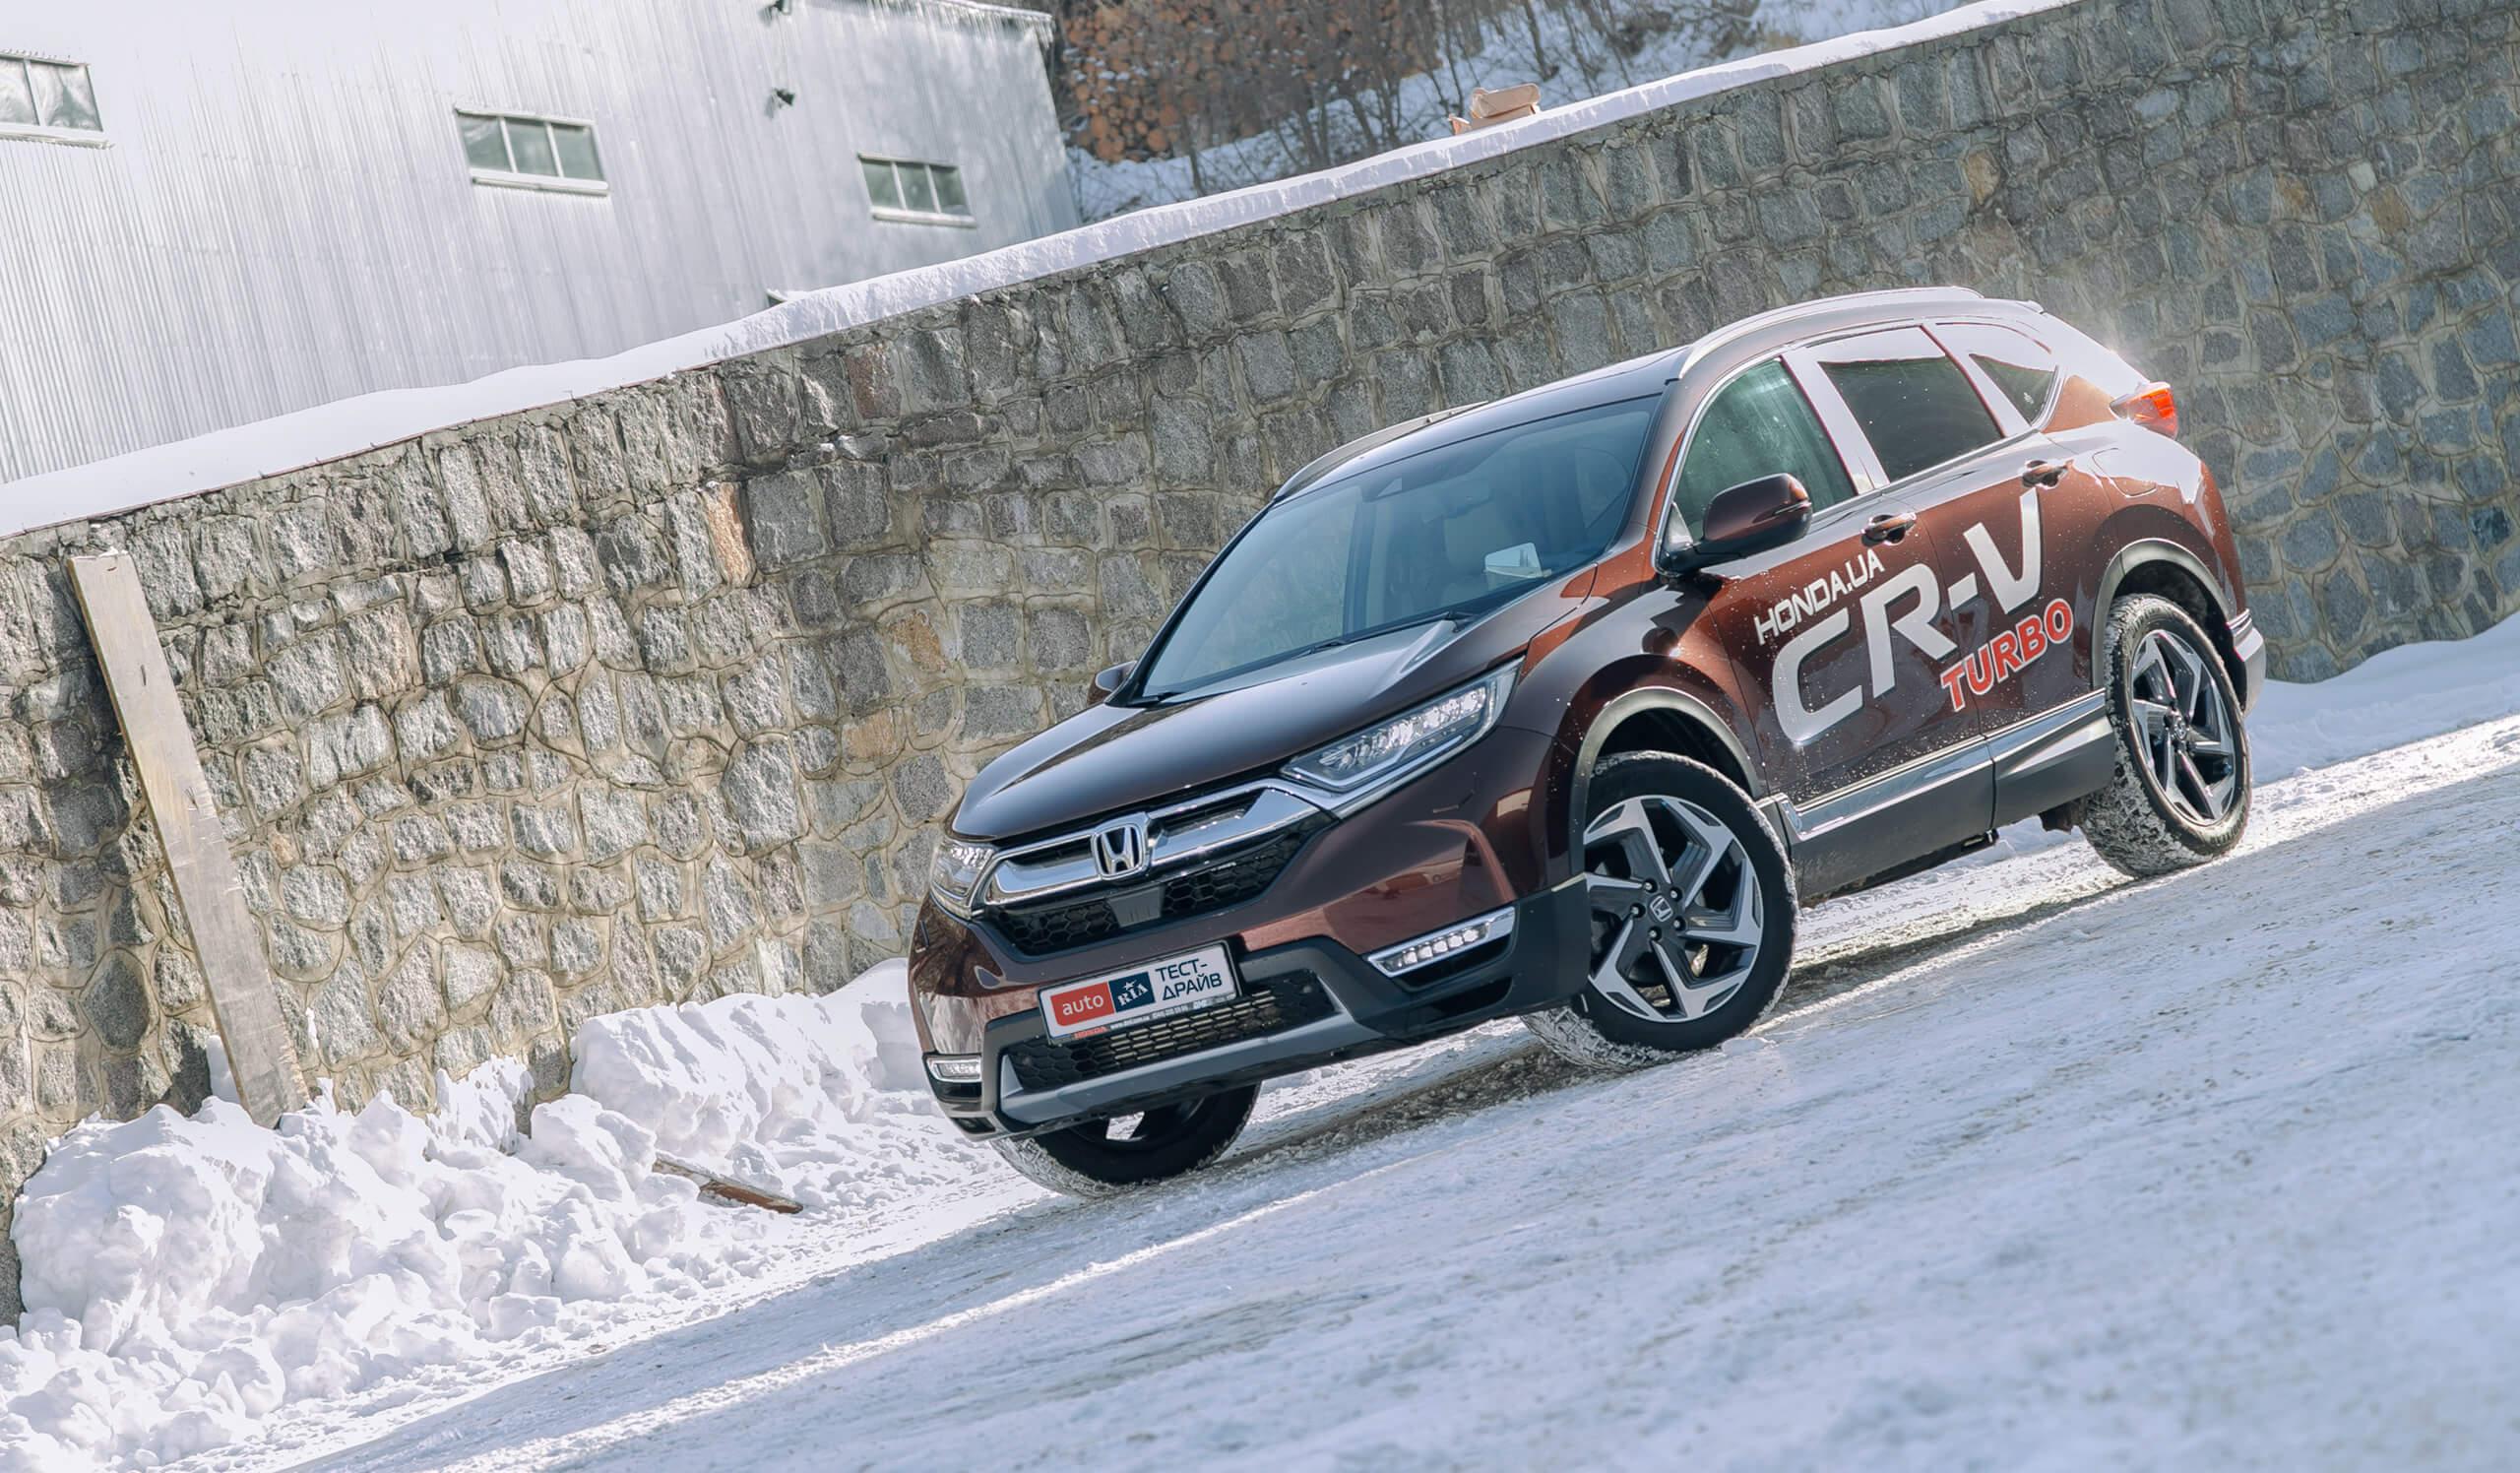 Honda CR-V Turbo: Дай миллион!, cтраница 3